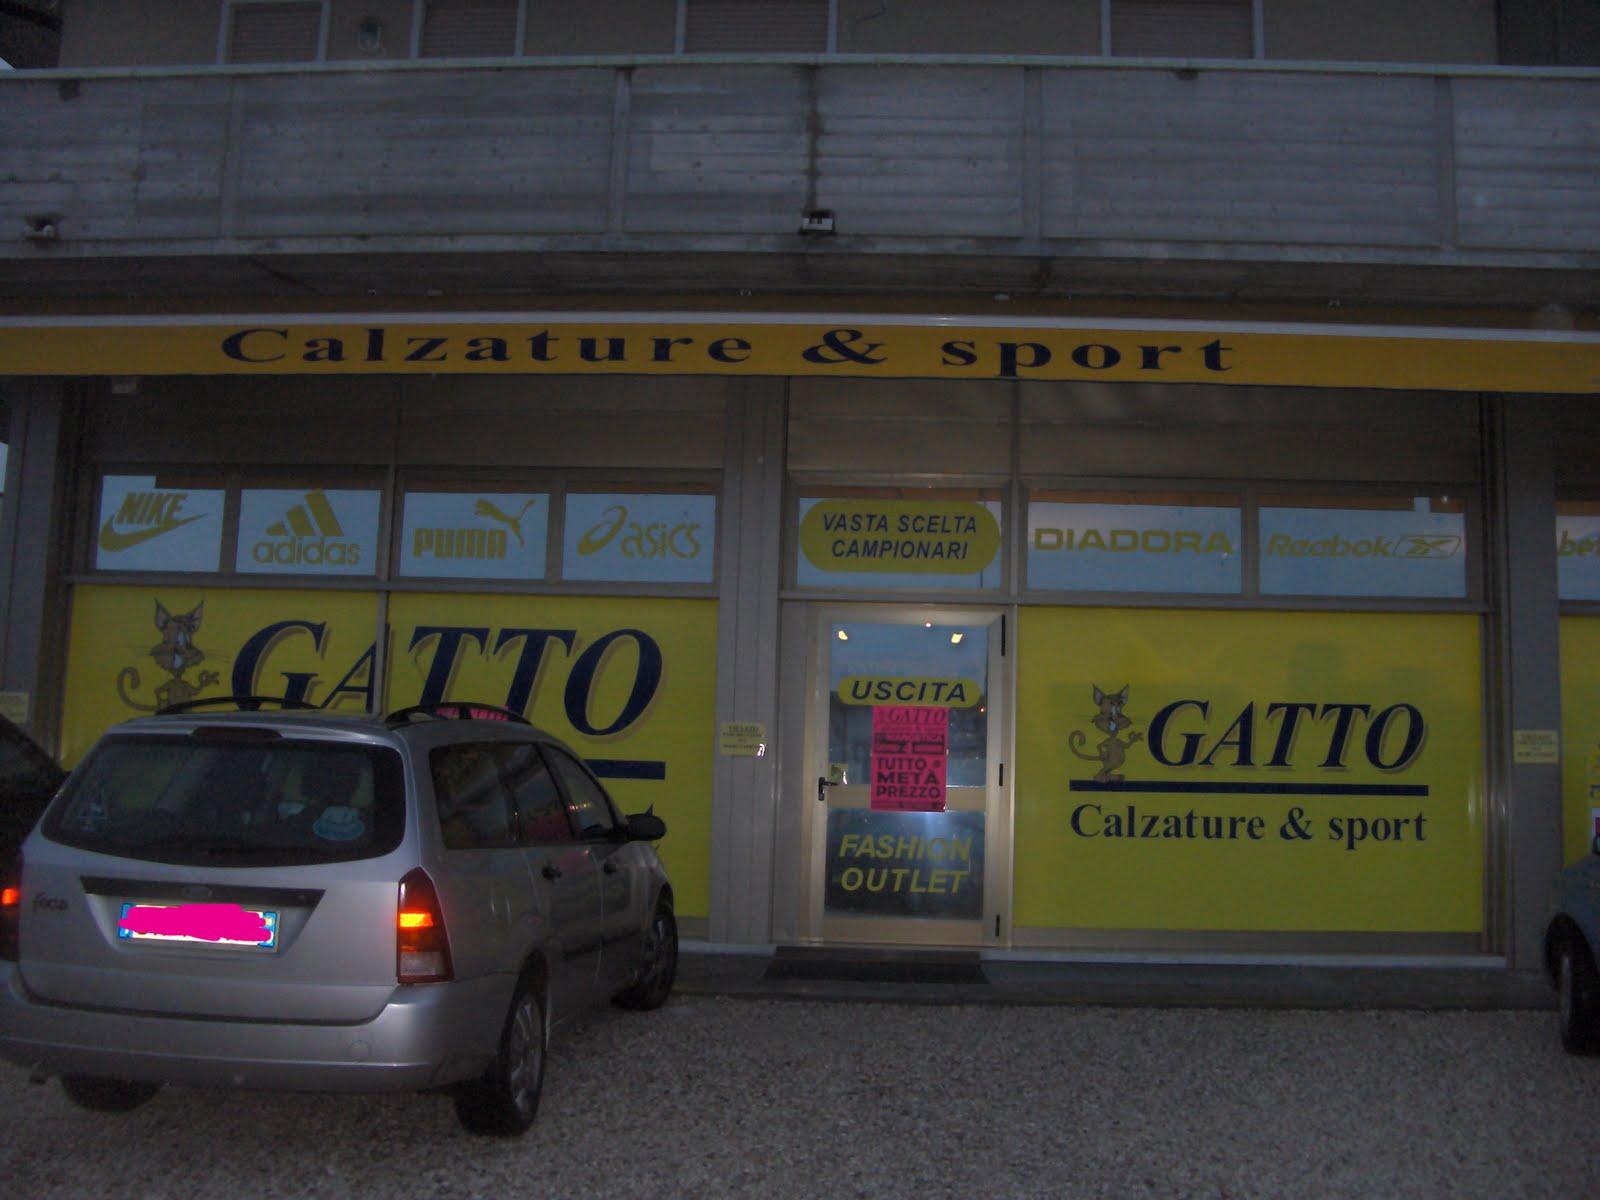 ItaliaGatto Spacci In ItaliaGatto Spacci In Calzatureamp; Sport Nnm8v0w